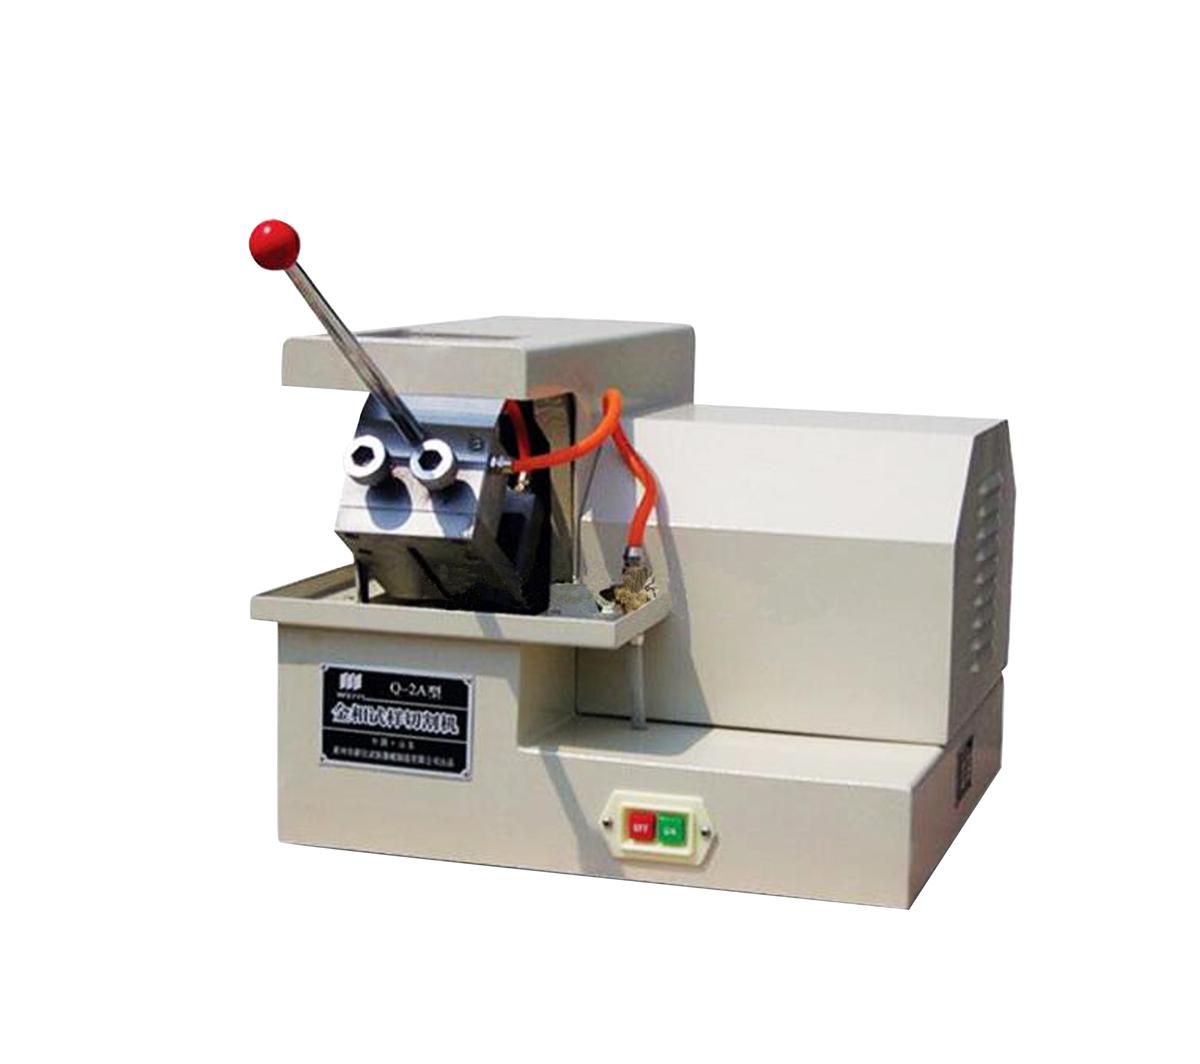 Laboratory Metallographic Sample Cutting Machine CY-Uni-155D